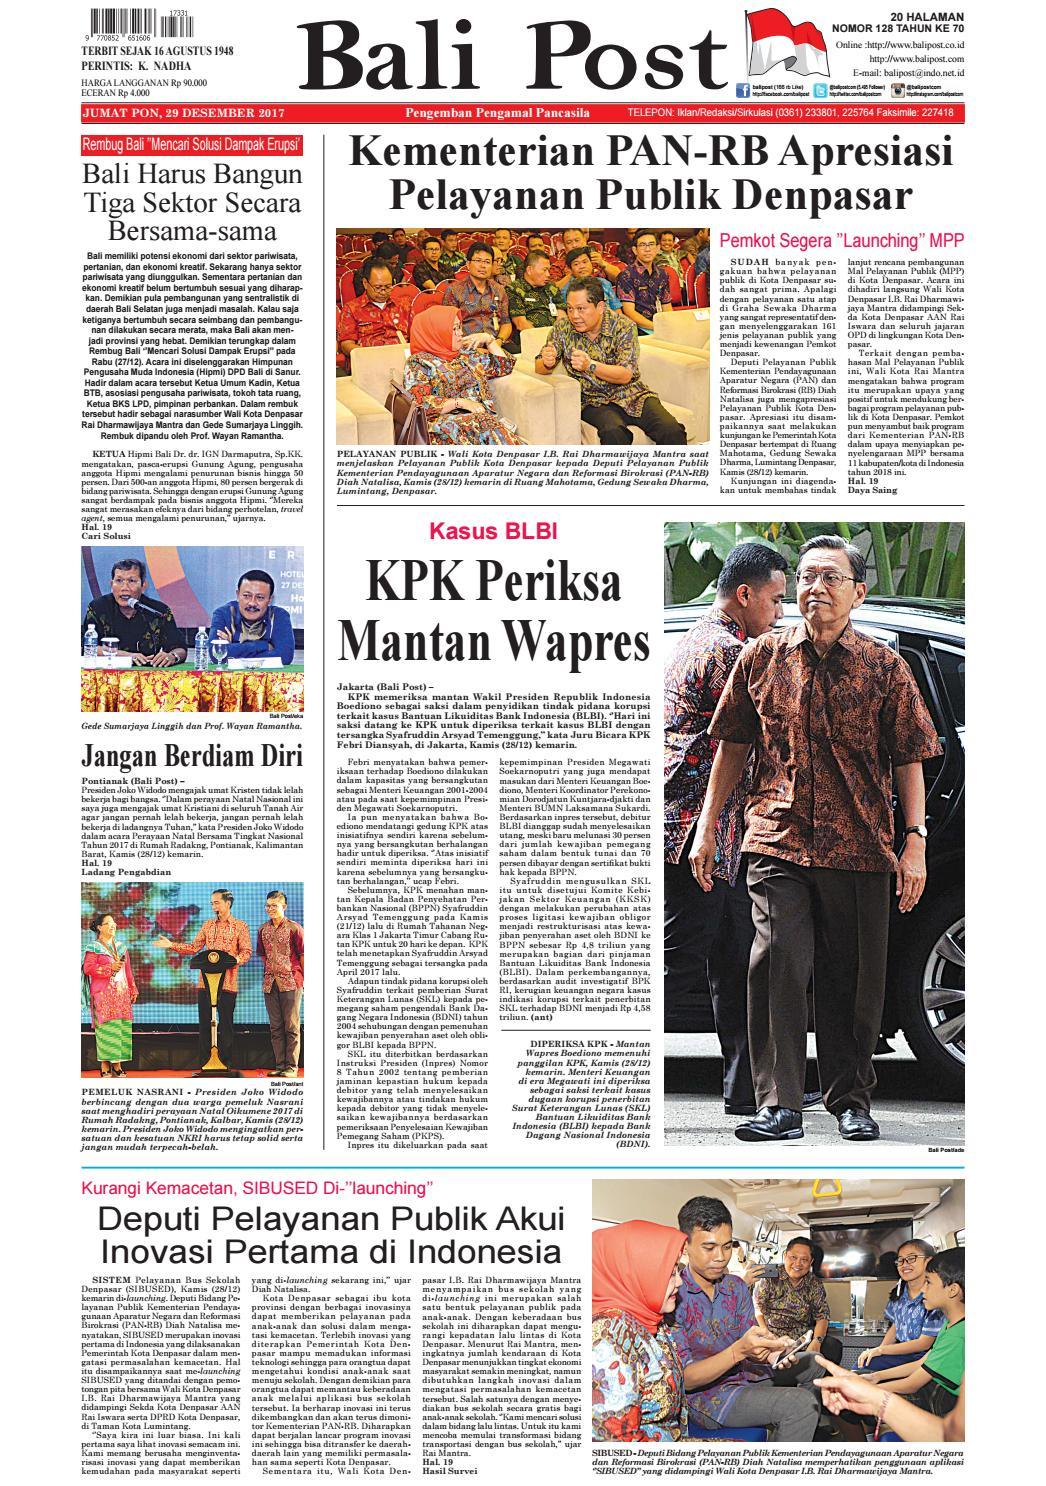 Edisi 29 Desember 2017